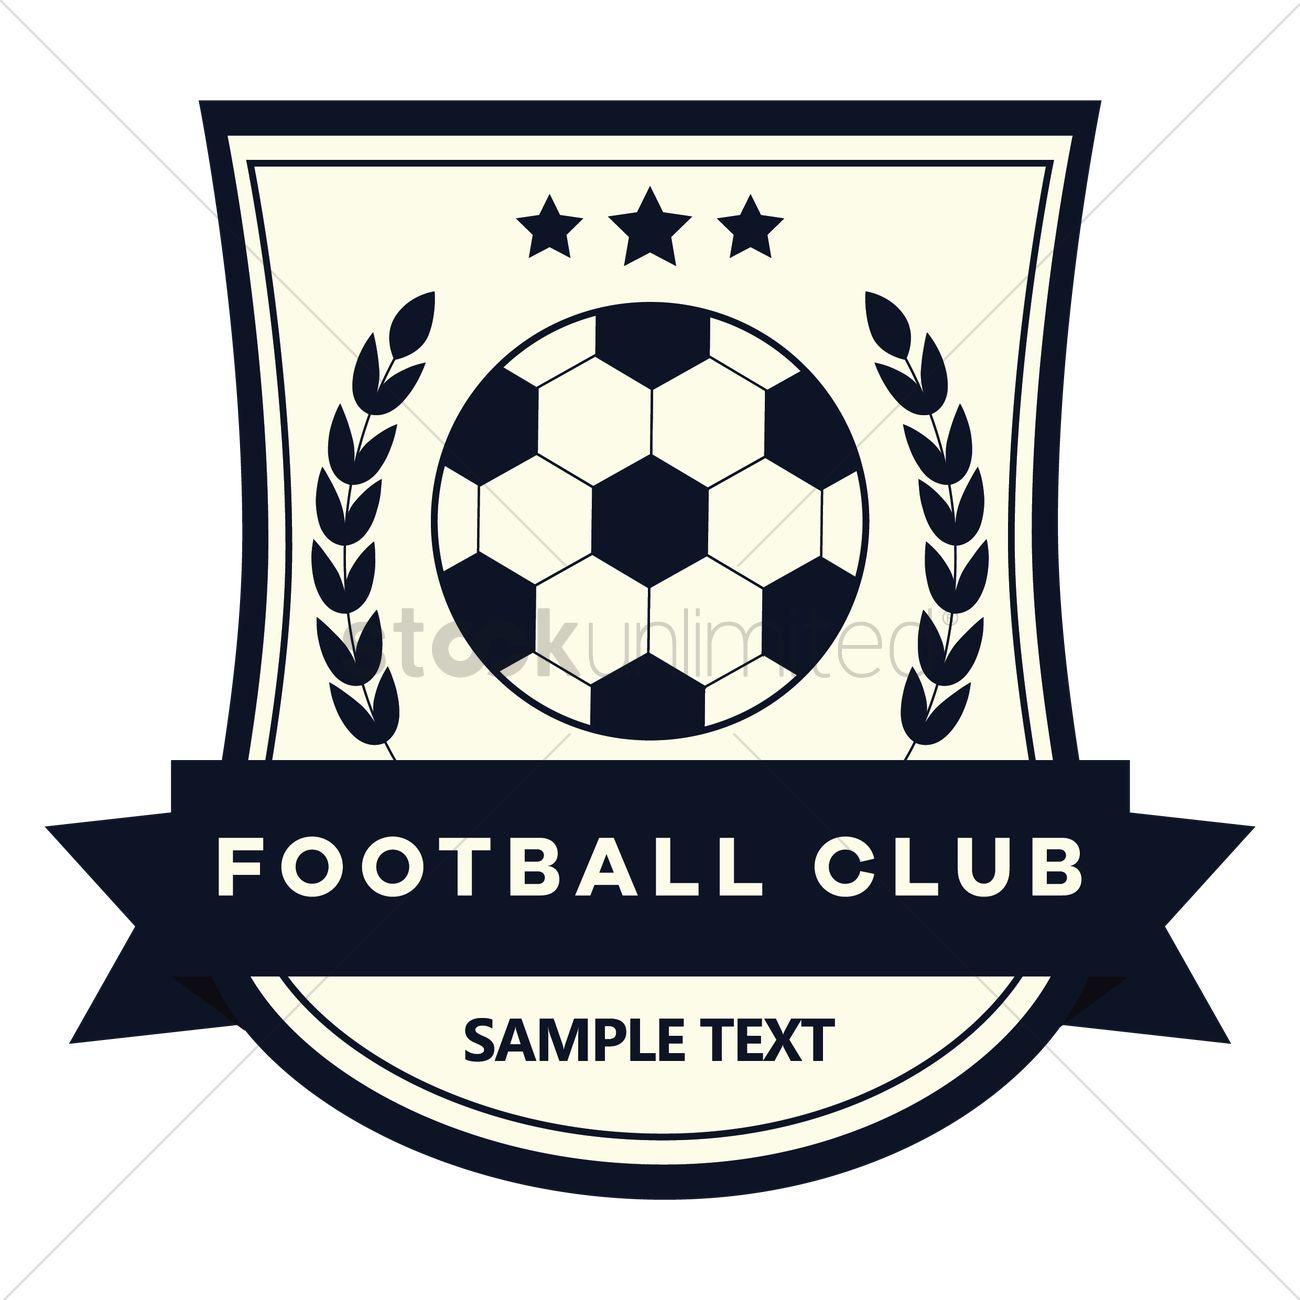 Football club logo Vector Image - 1527032 | StockUnlimited